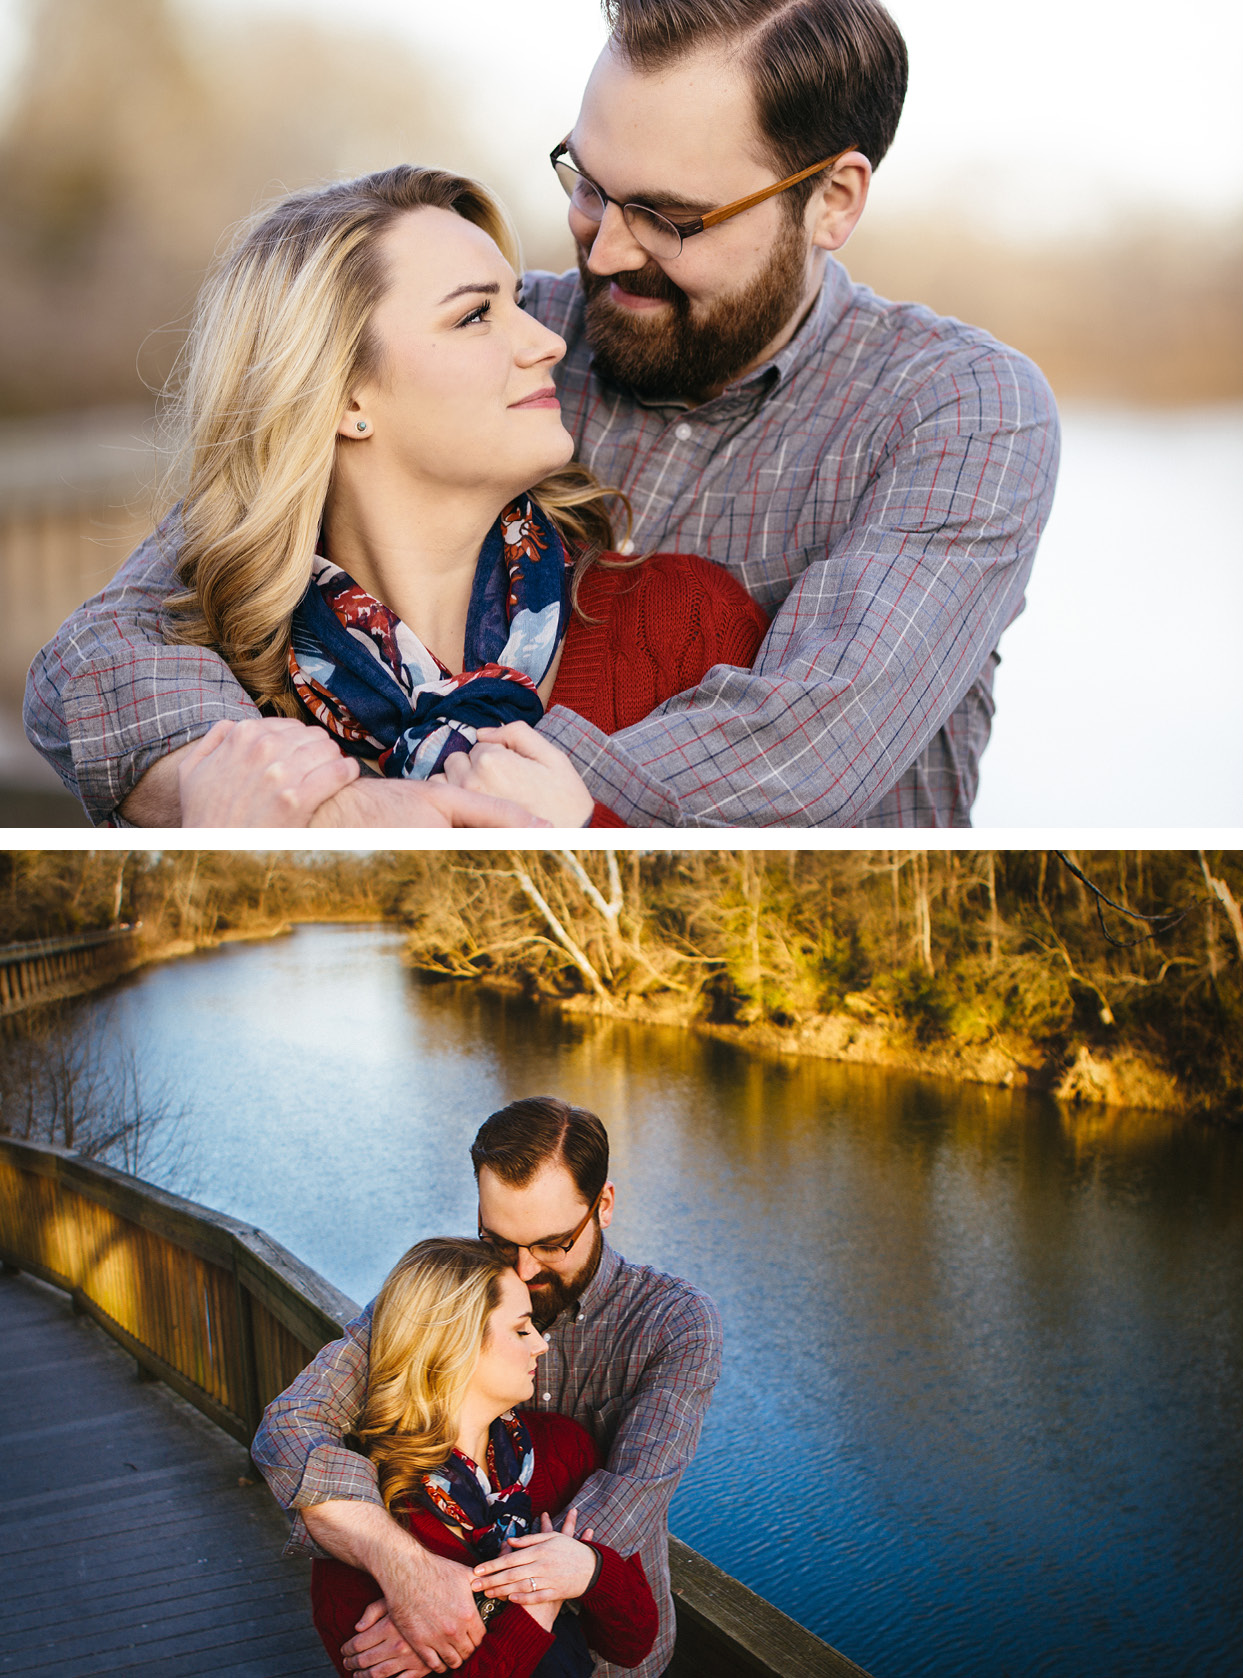 CK-Photo-Nashville-Engagement-Photographer-st-7.jpg